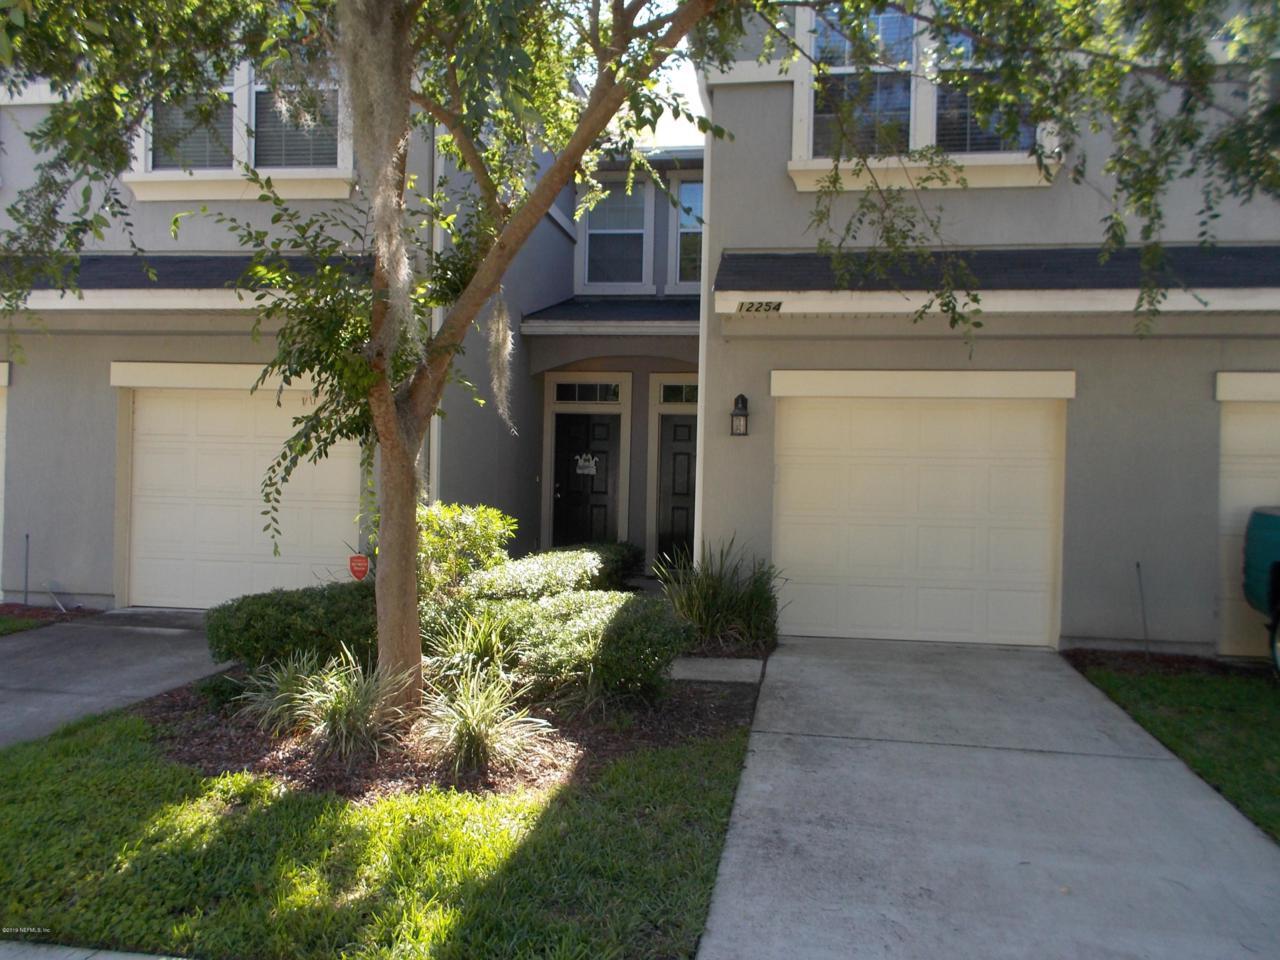 Groovy 12254 Black Walnut Ct Jacksonville Fl 32226 Mls 995279 Berkshire Hathaway Homeservices Chaplin Williams Realty Download Free Architecture Designs Grimeyleaguecom